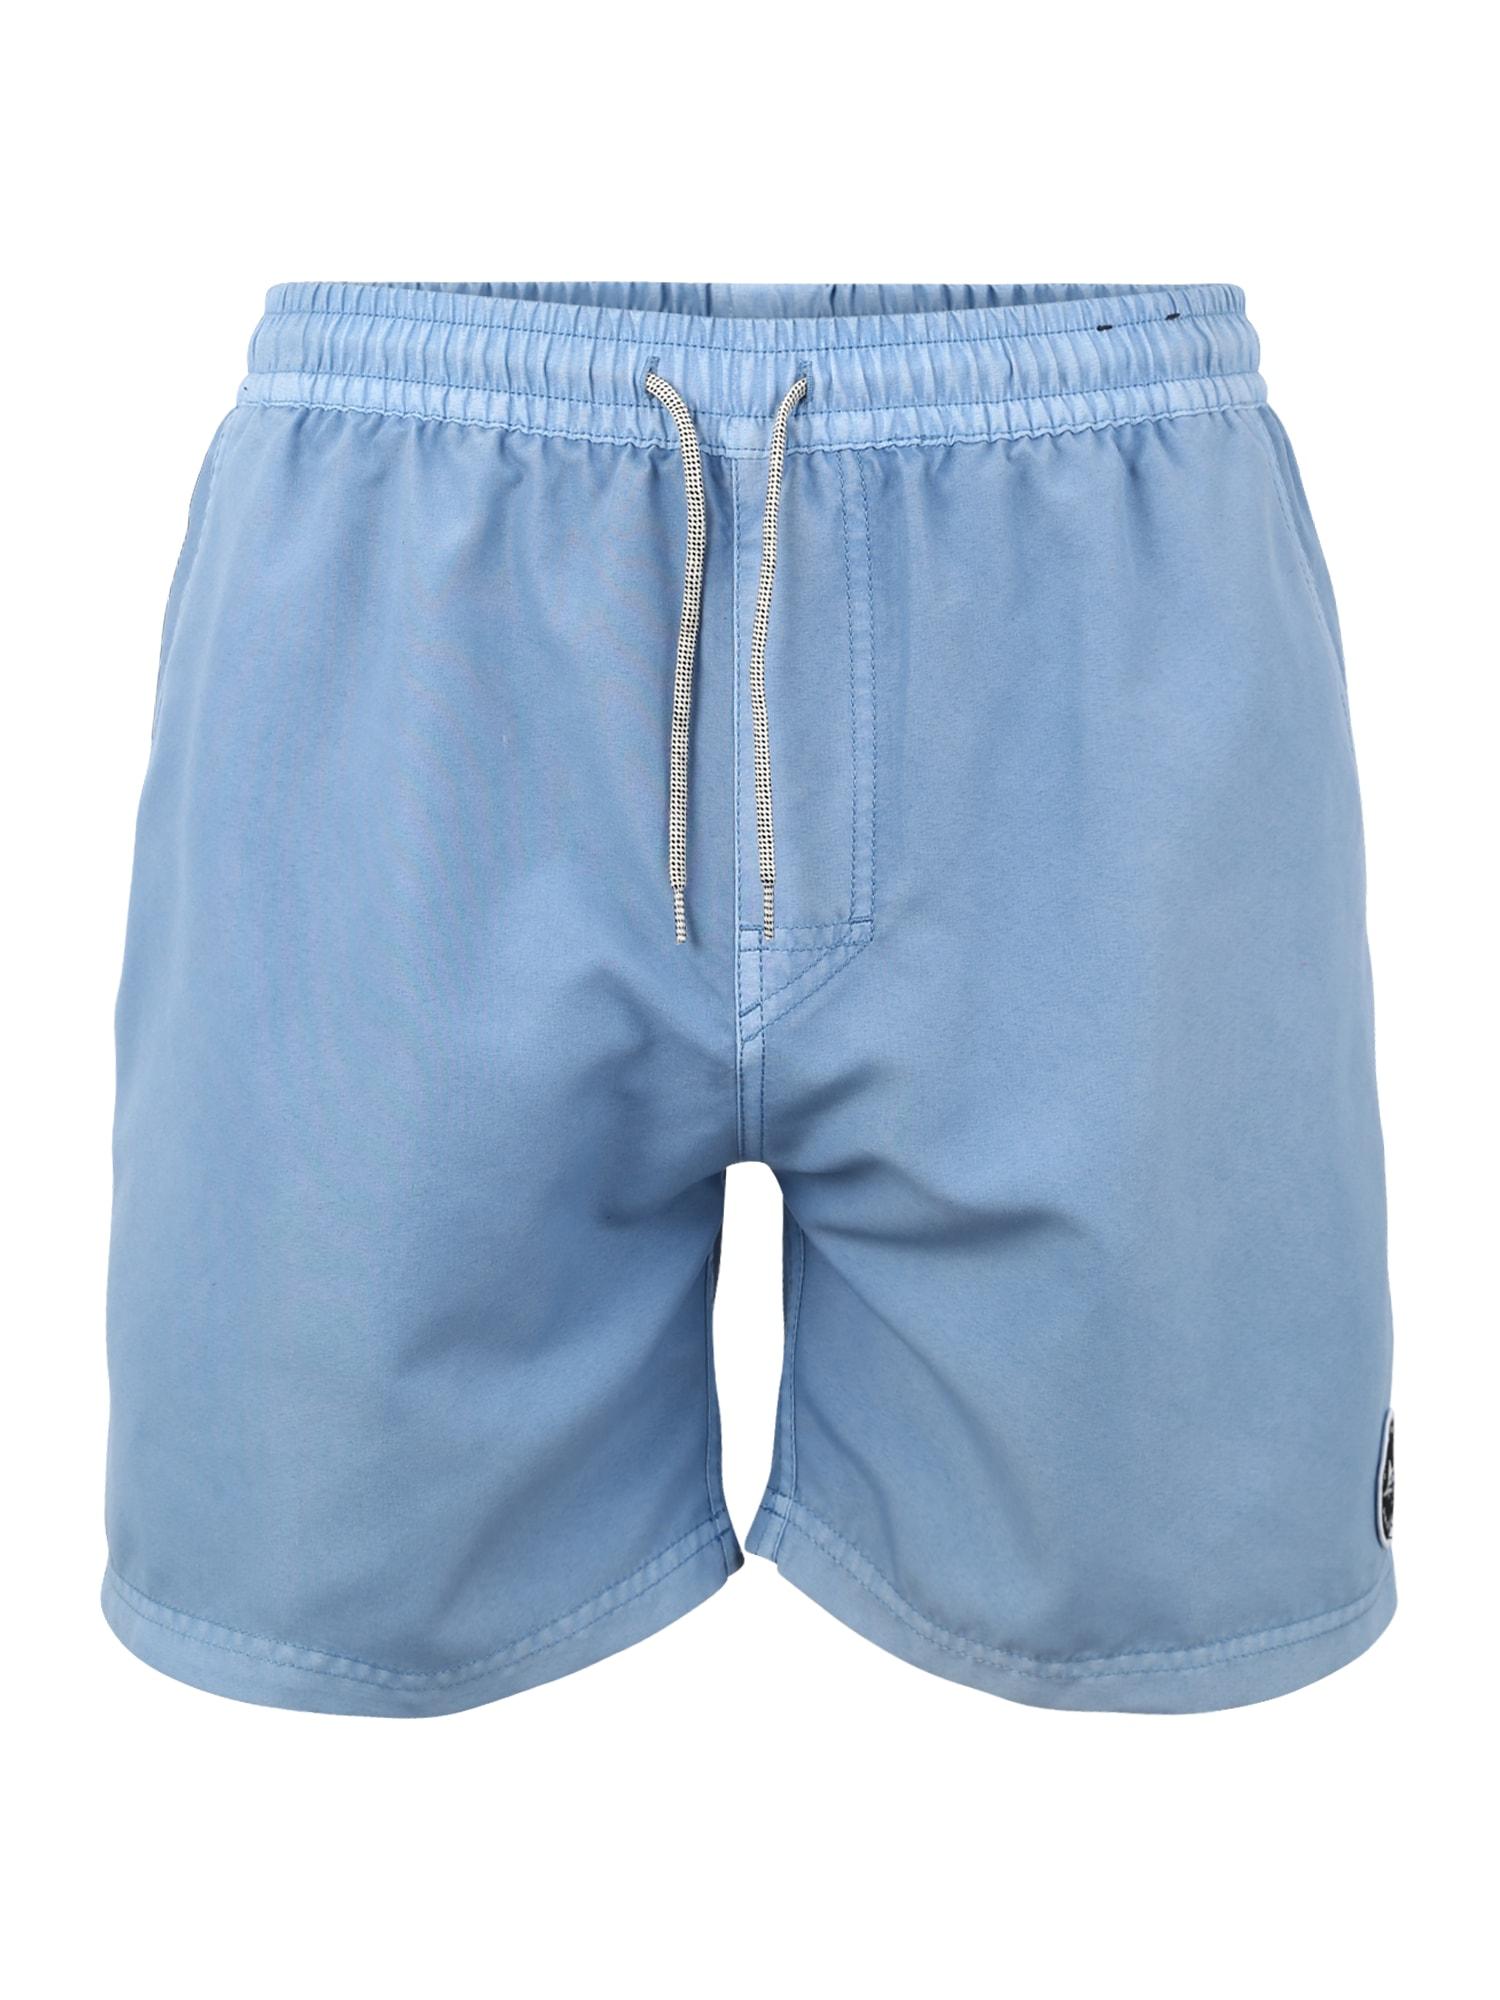 Plavecké šortky VOLLEY SUNSET SHADES 16 modrá RIP CURL